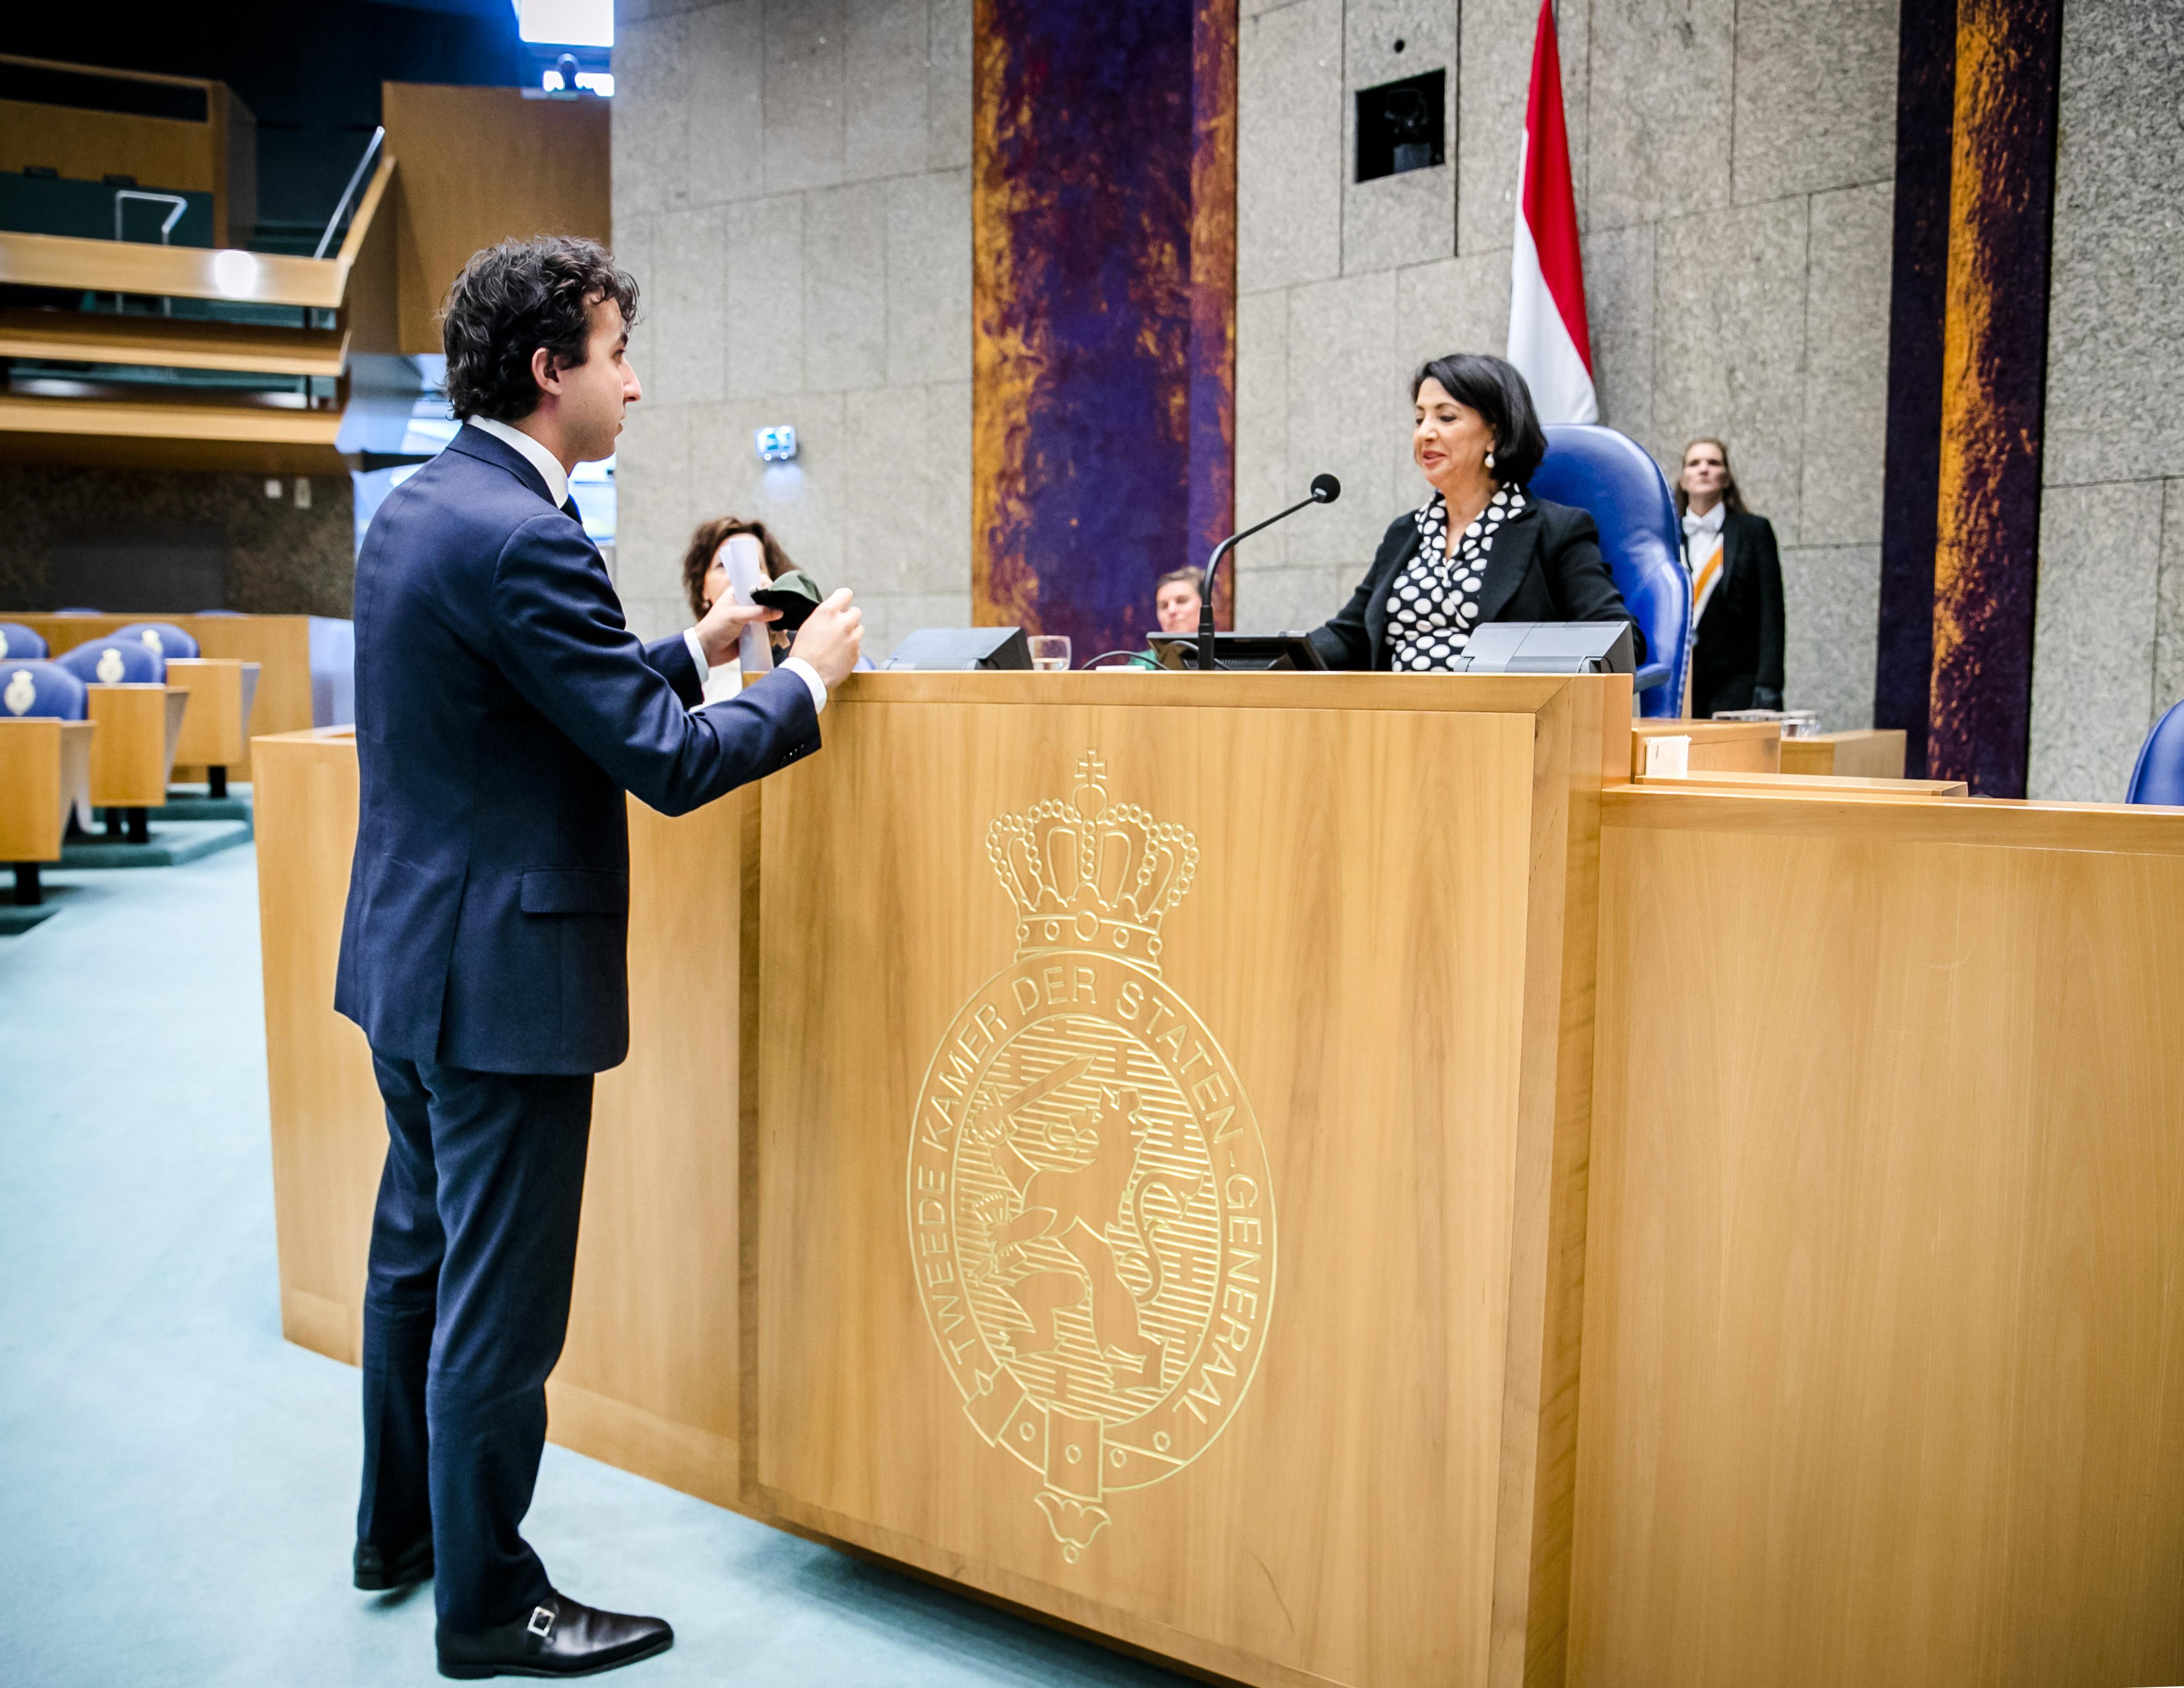 Meerderheid Tweede Kamer wil mondkapjes in winkels, horeca en publieke ruimtes